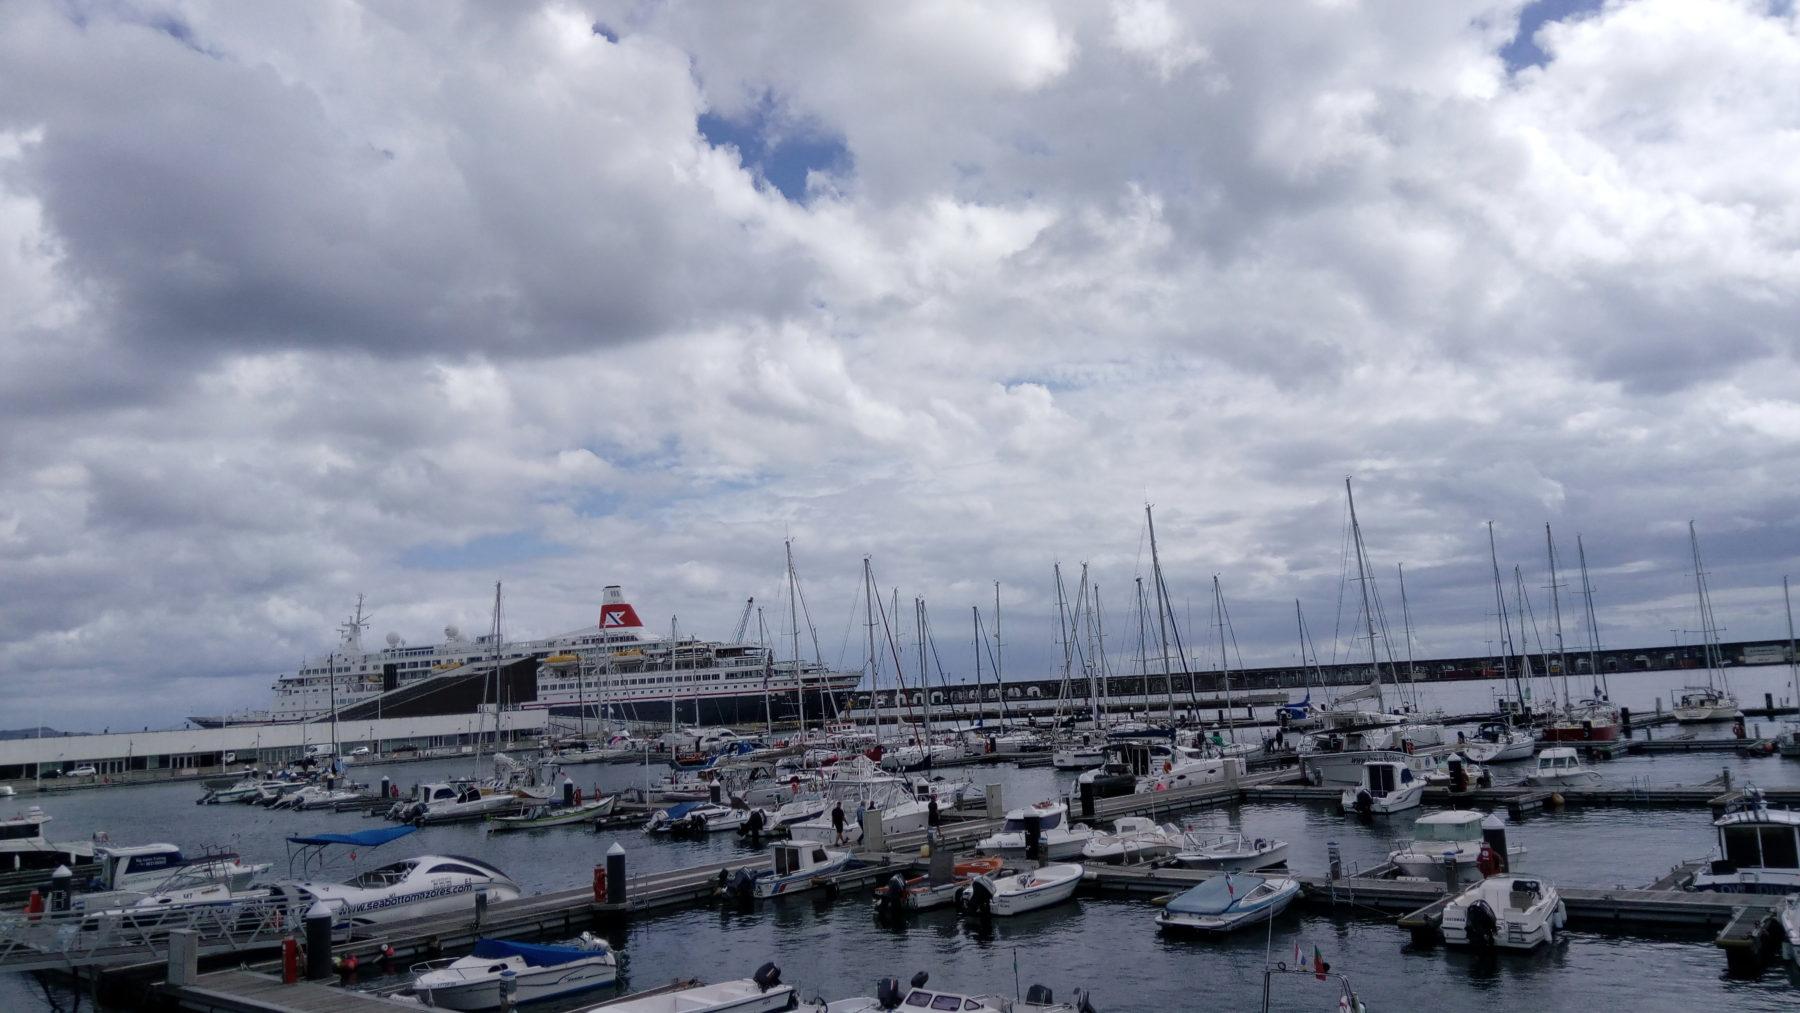 Portas do mar, Ponta Delgada